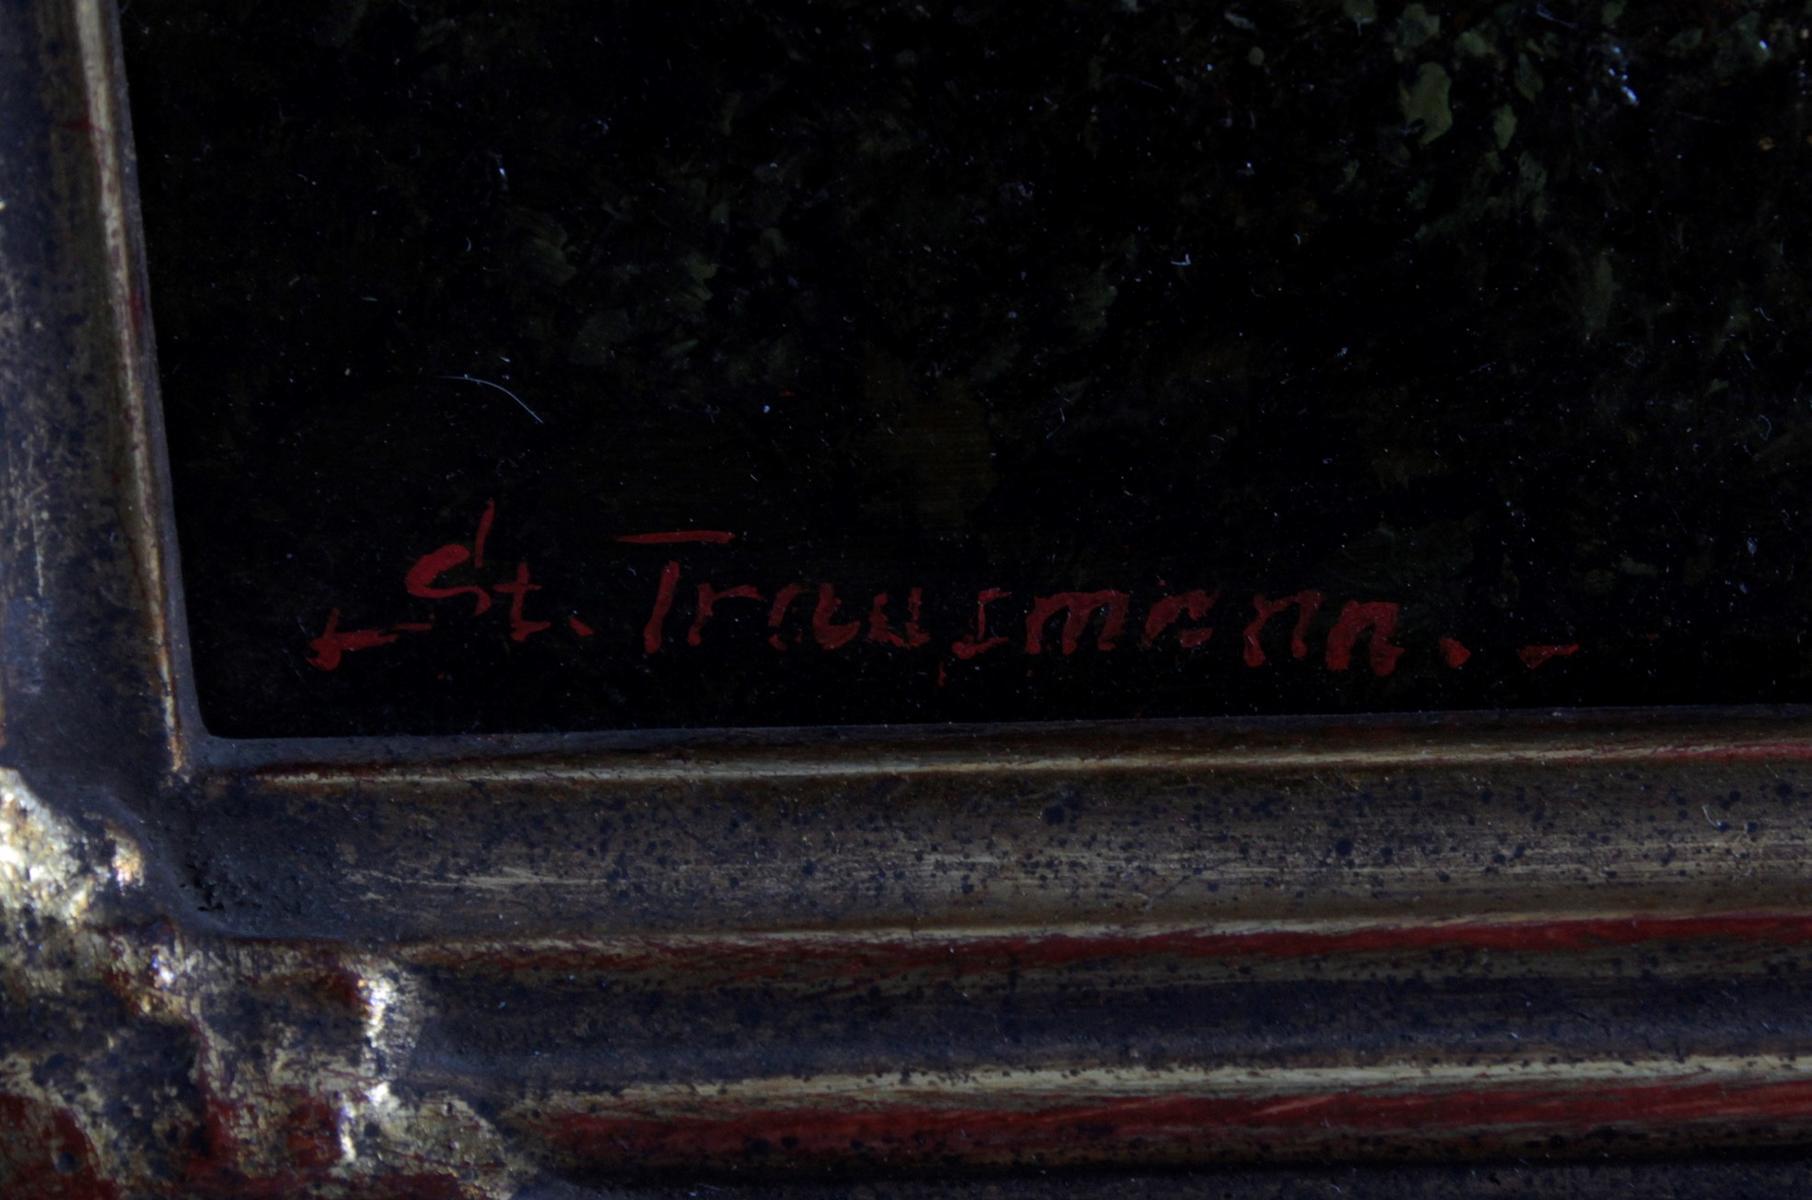 St. Trautmann. Maler 2. Hälfte 20. Jahrhundert-3